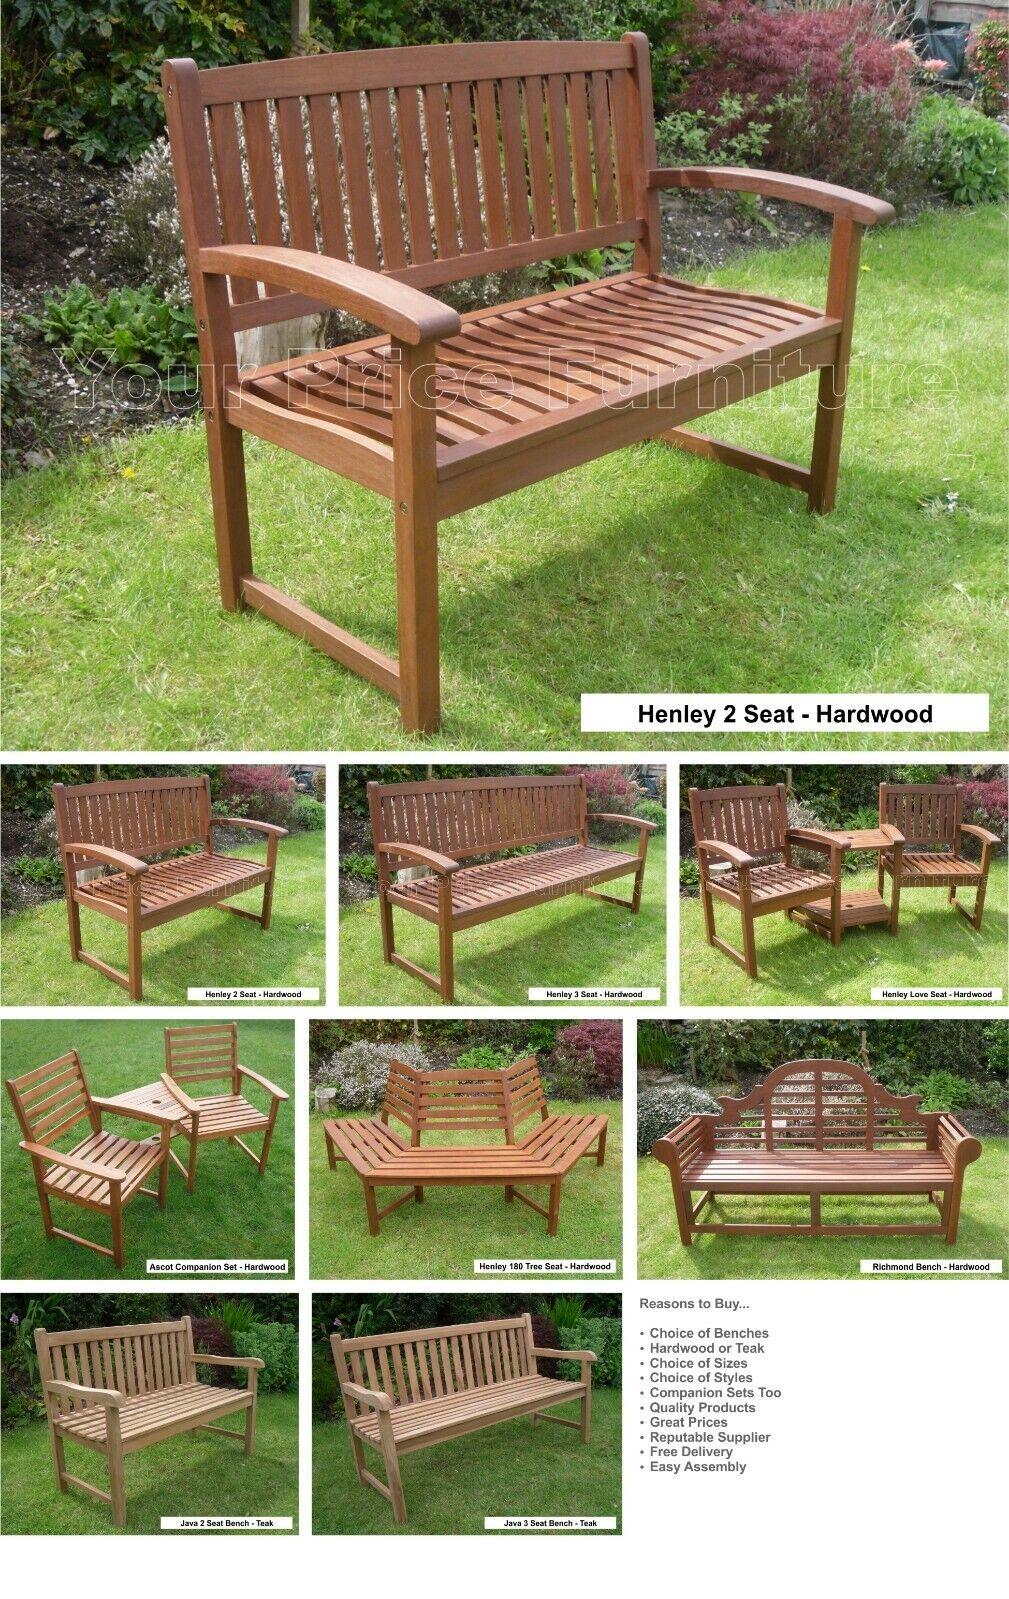 Henley Hardwood 3 Seat Garden Bench Great Outdoor Furniture For Your Garden Or Patio